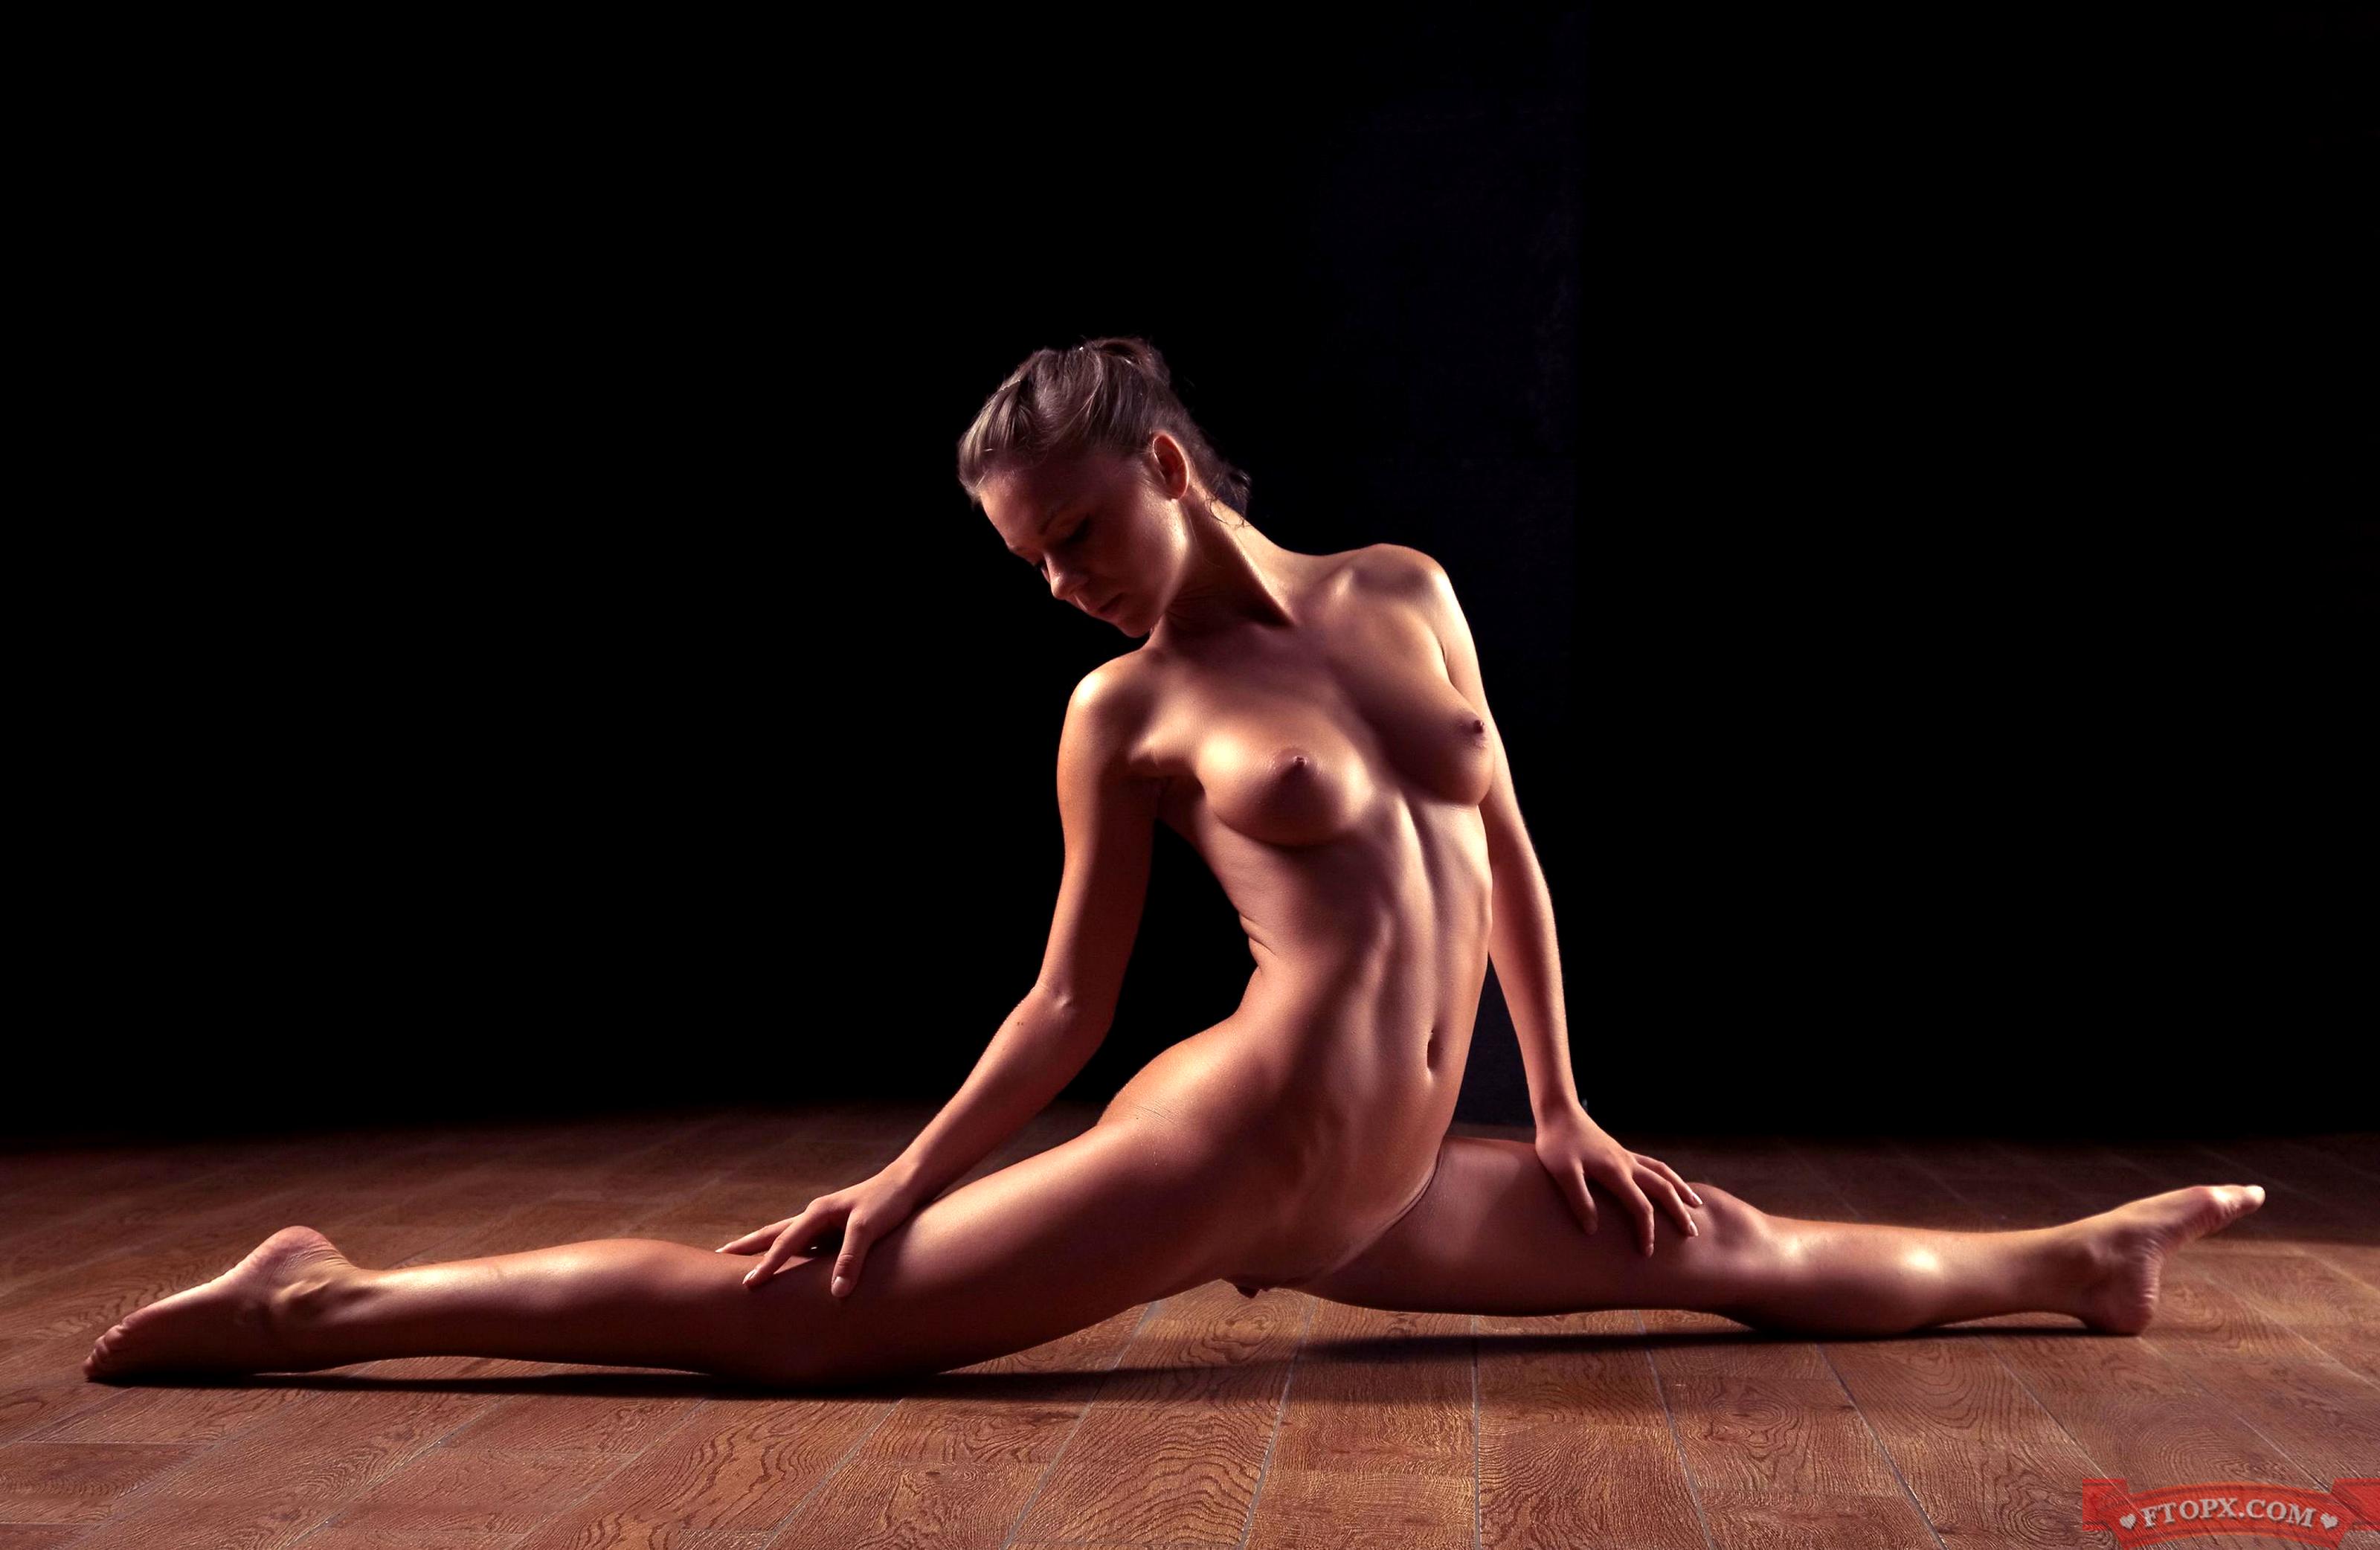 Zlata flexible women naked